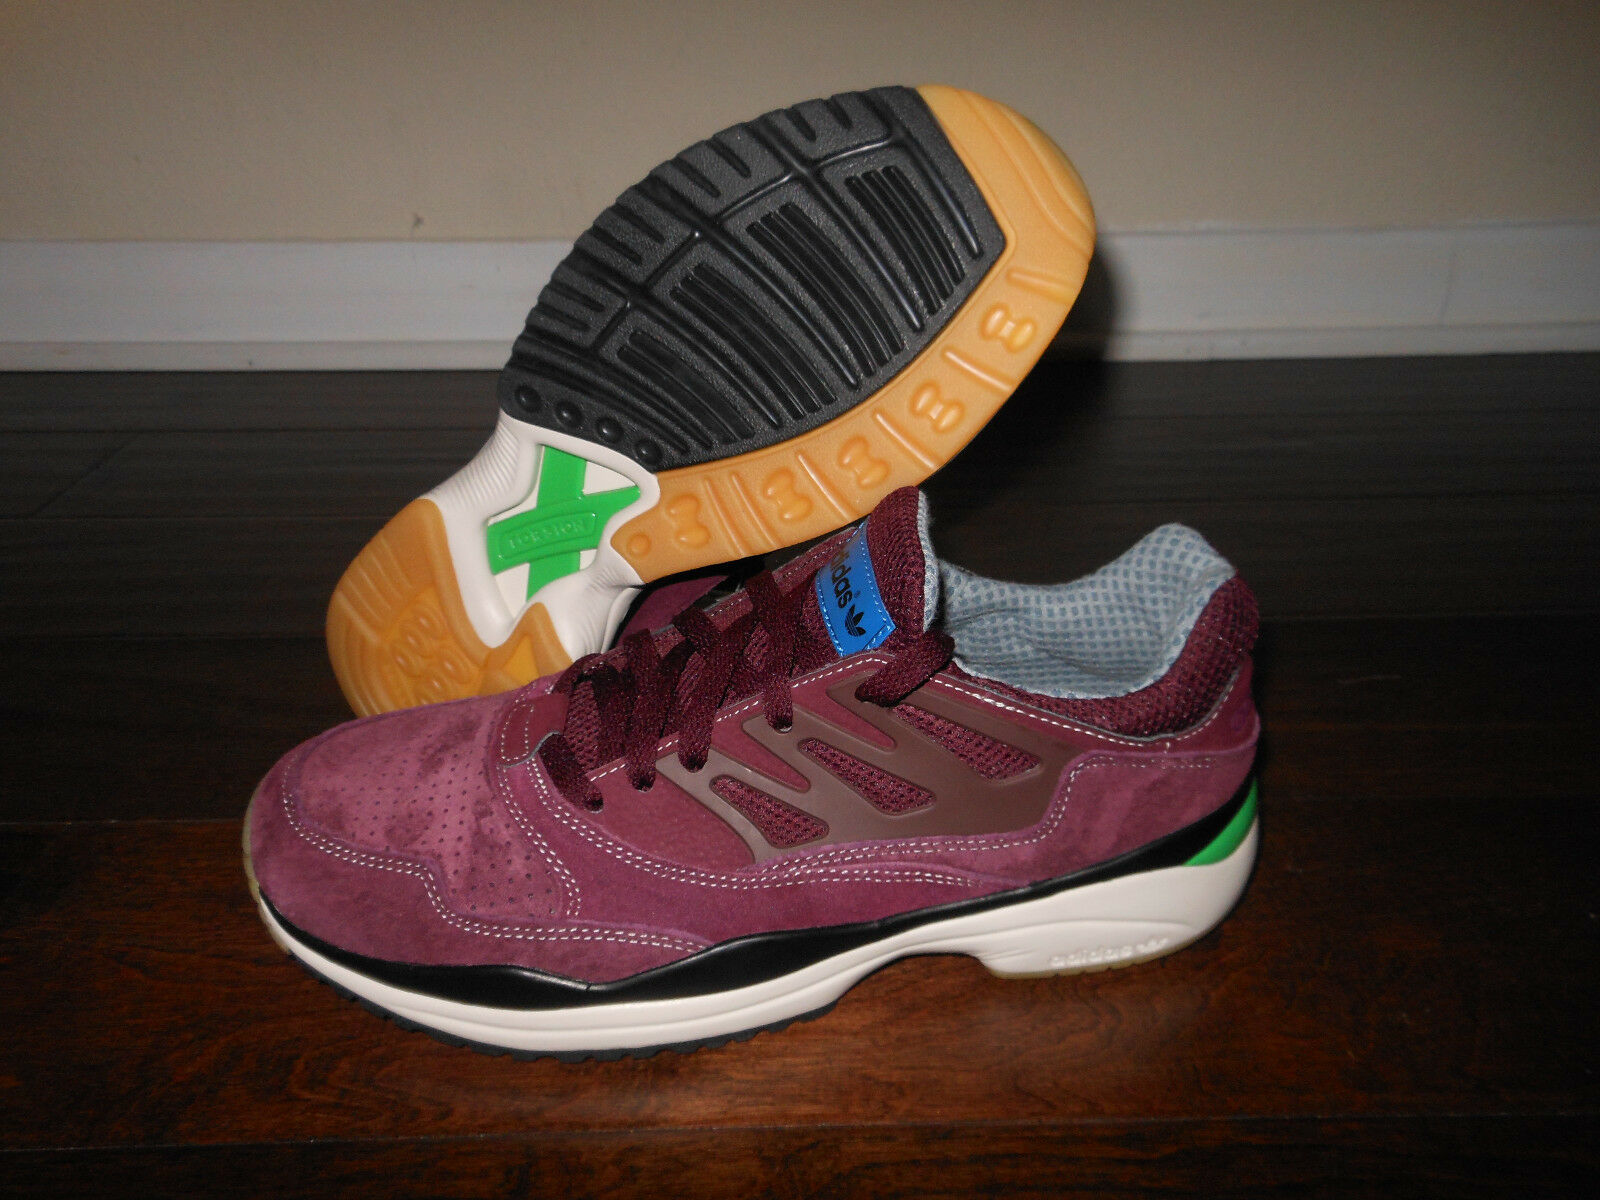 ADIDAS TORSION ALLEGRA G96665 Athletic Shoes Size 8 Men 41 EUR Maroon